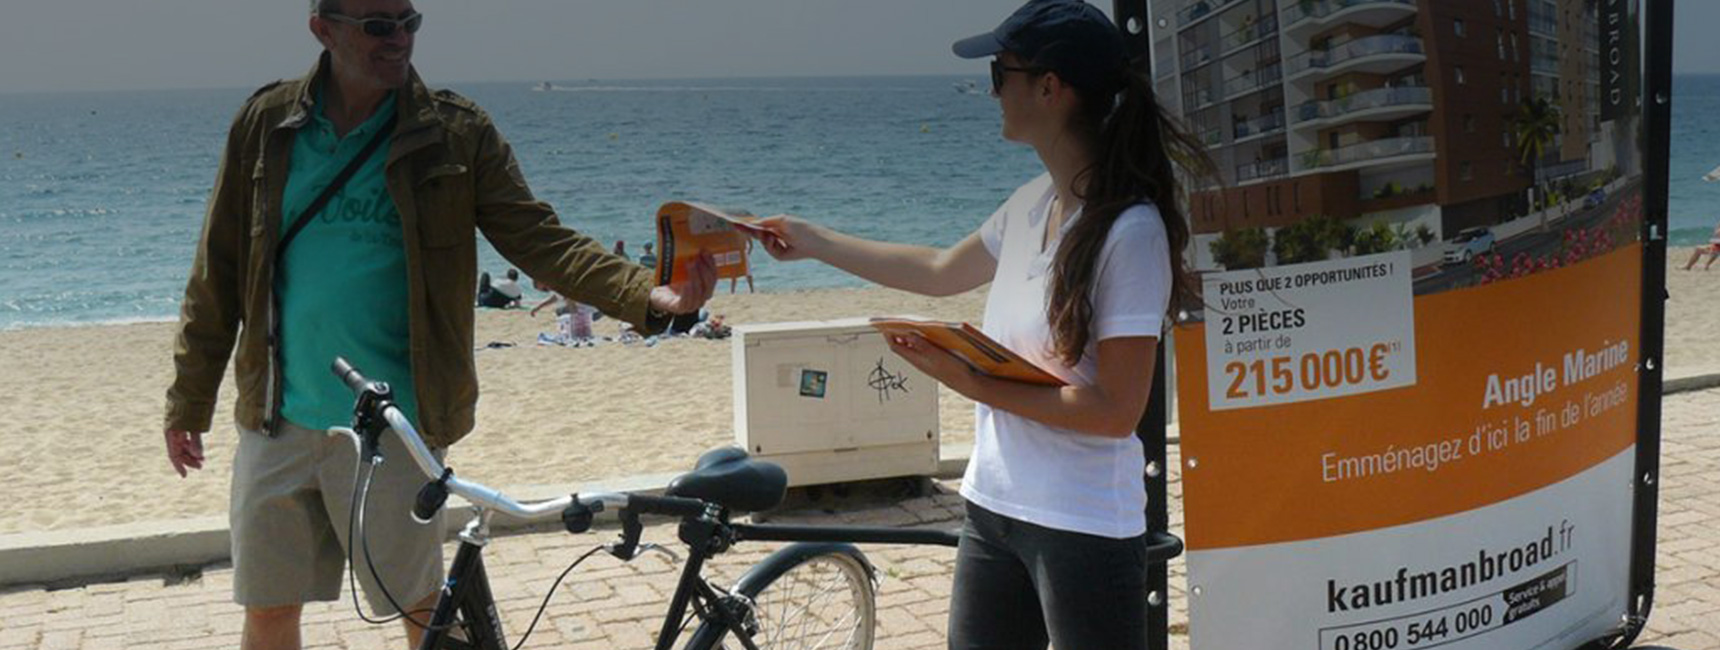 Kaufman ans Broad bike com street marketing Keemia Toulouse agence marketing local en region occitanie